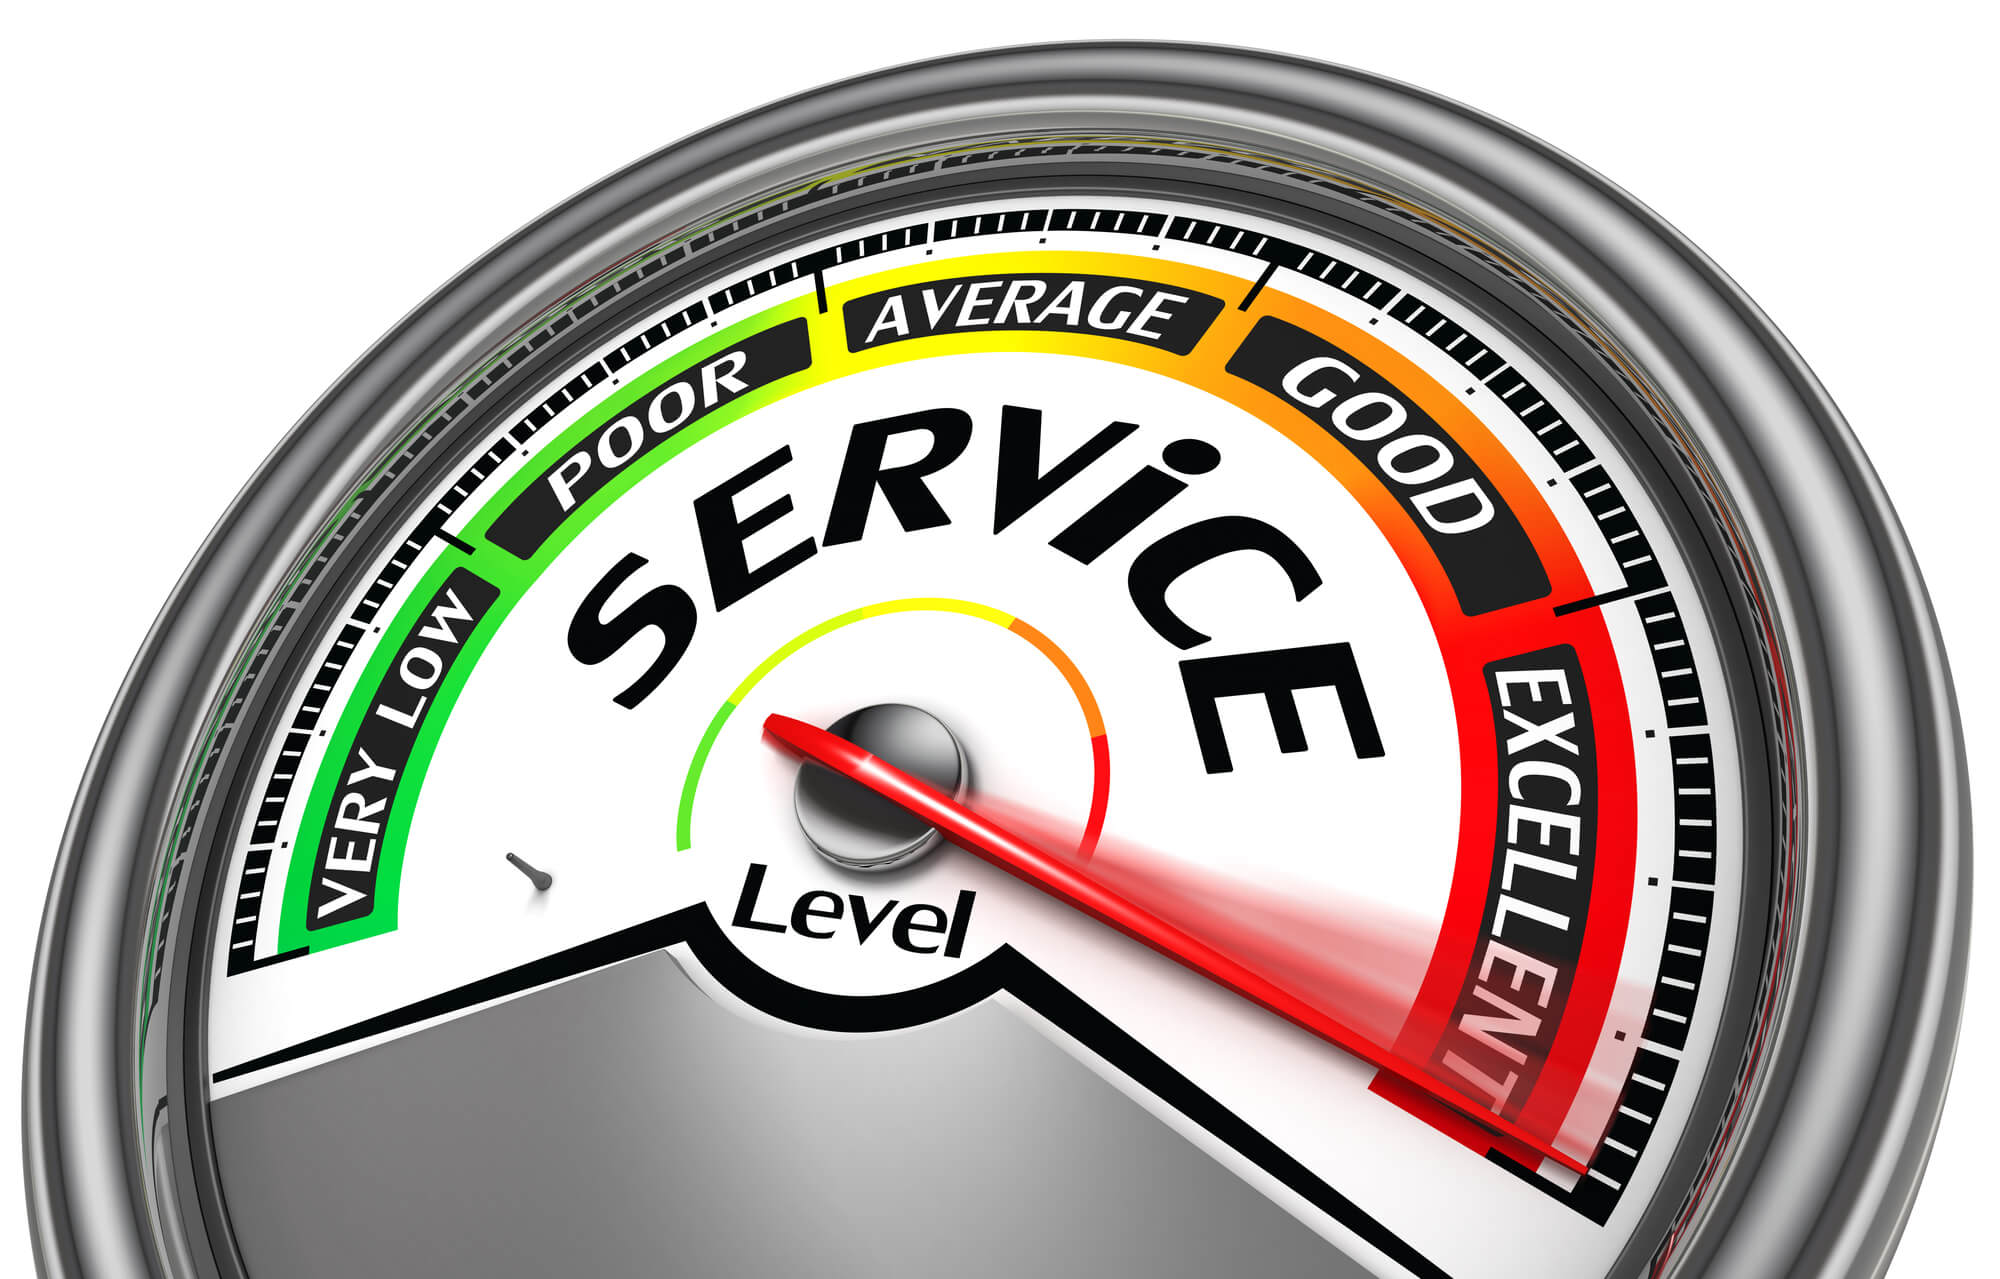 Time to Take Back Customer Service